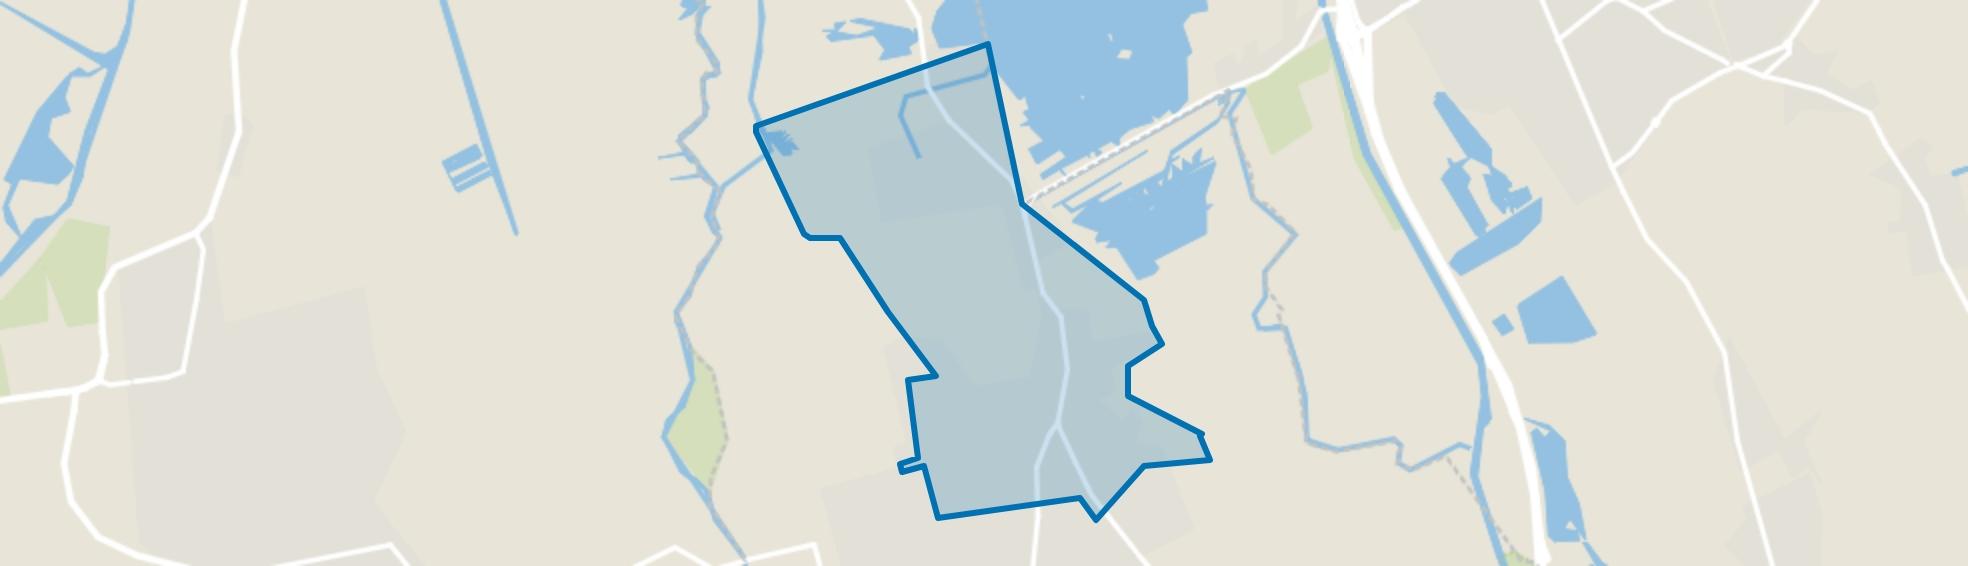 Paterswolde, Paterswolde map